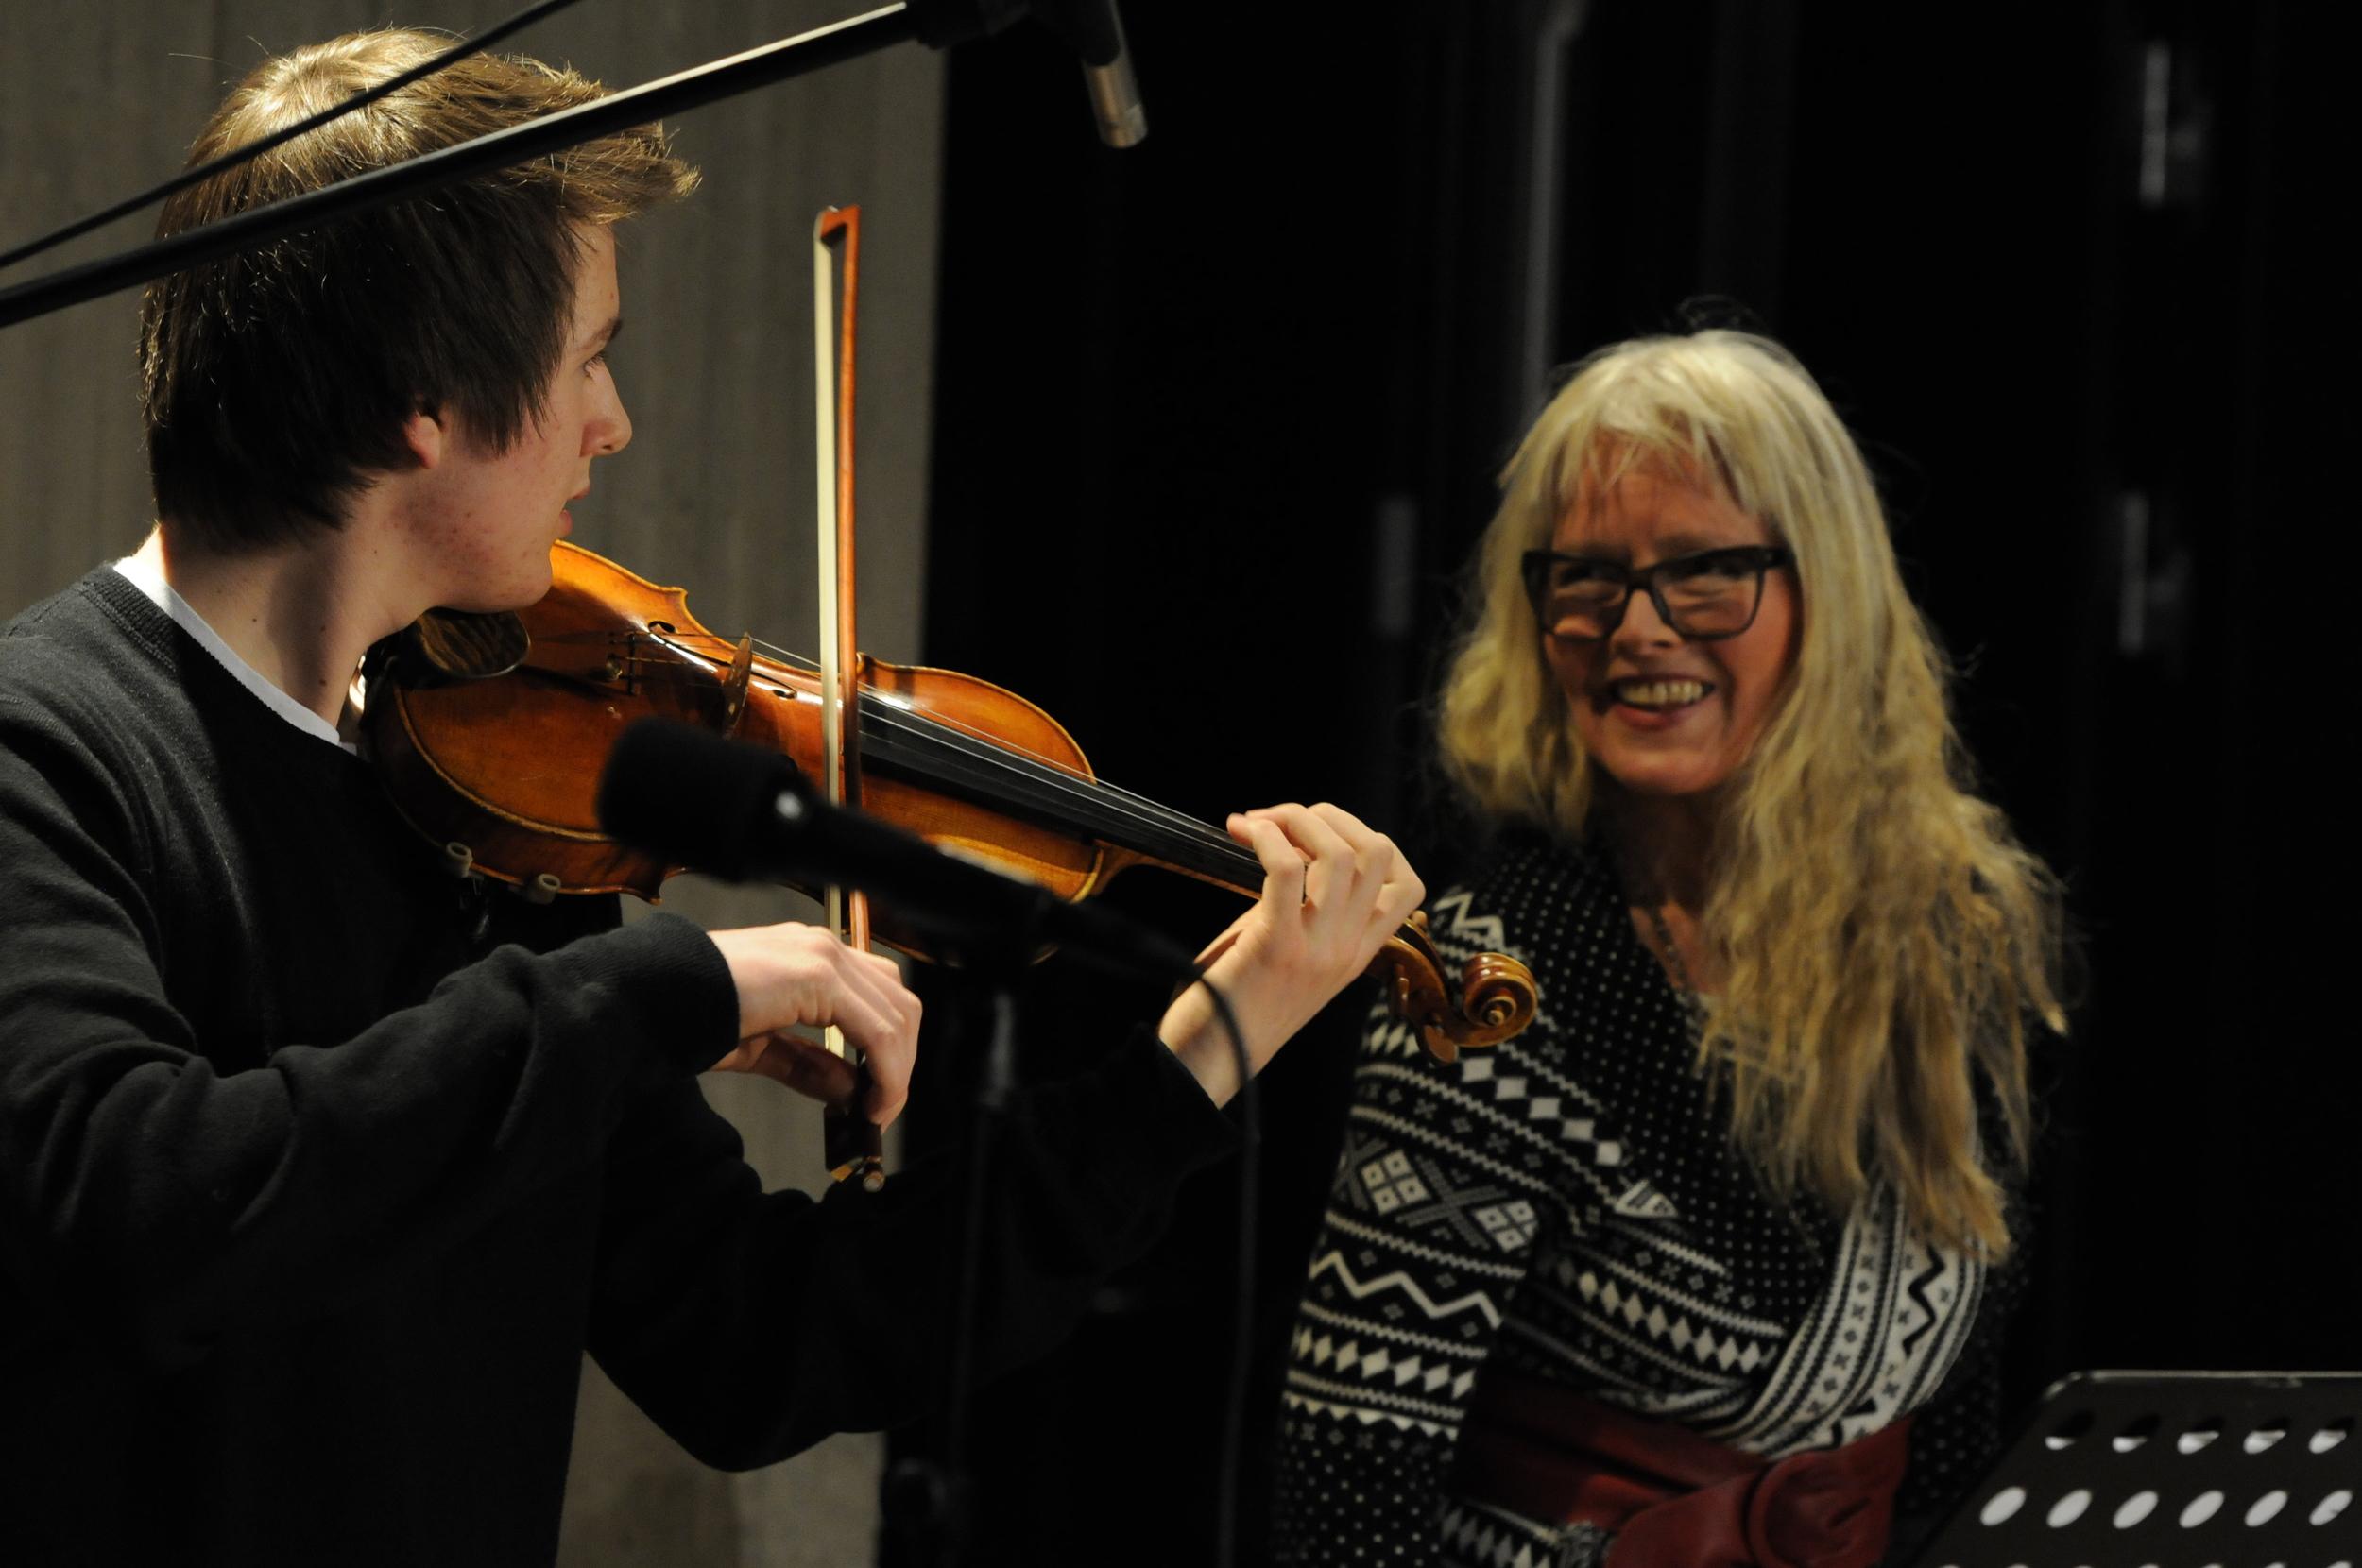 Andris Hemsing og MS, Valdres (2012) Foto: Ingvar Skattebu